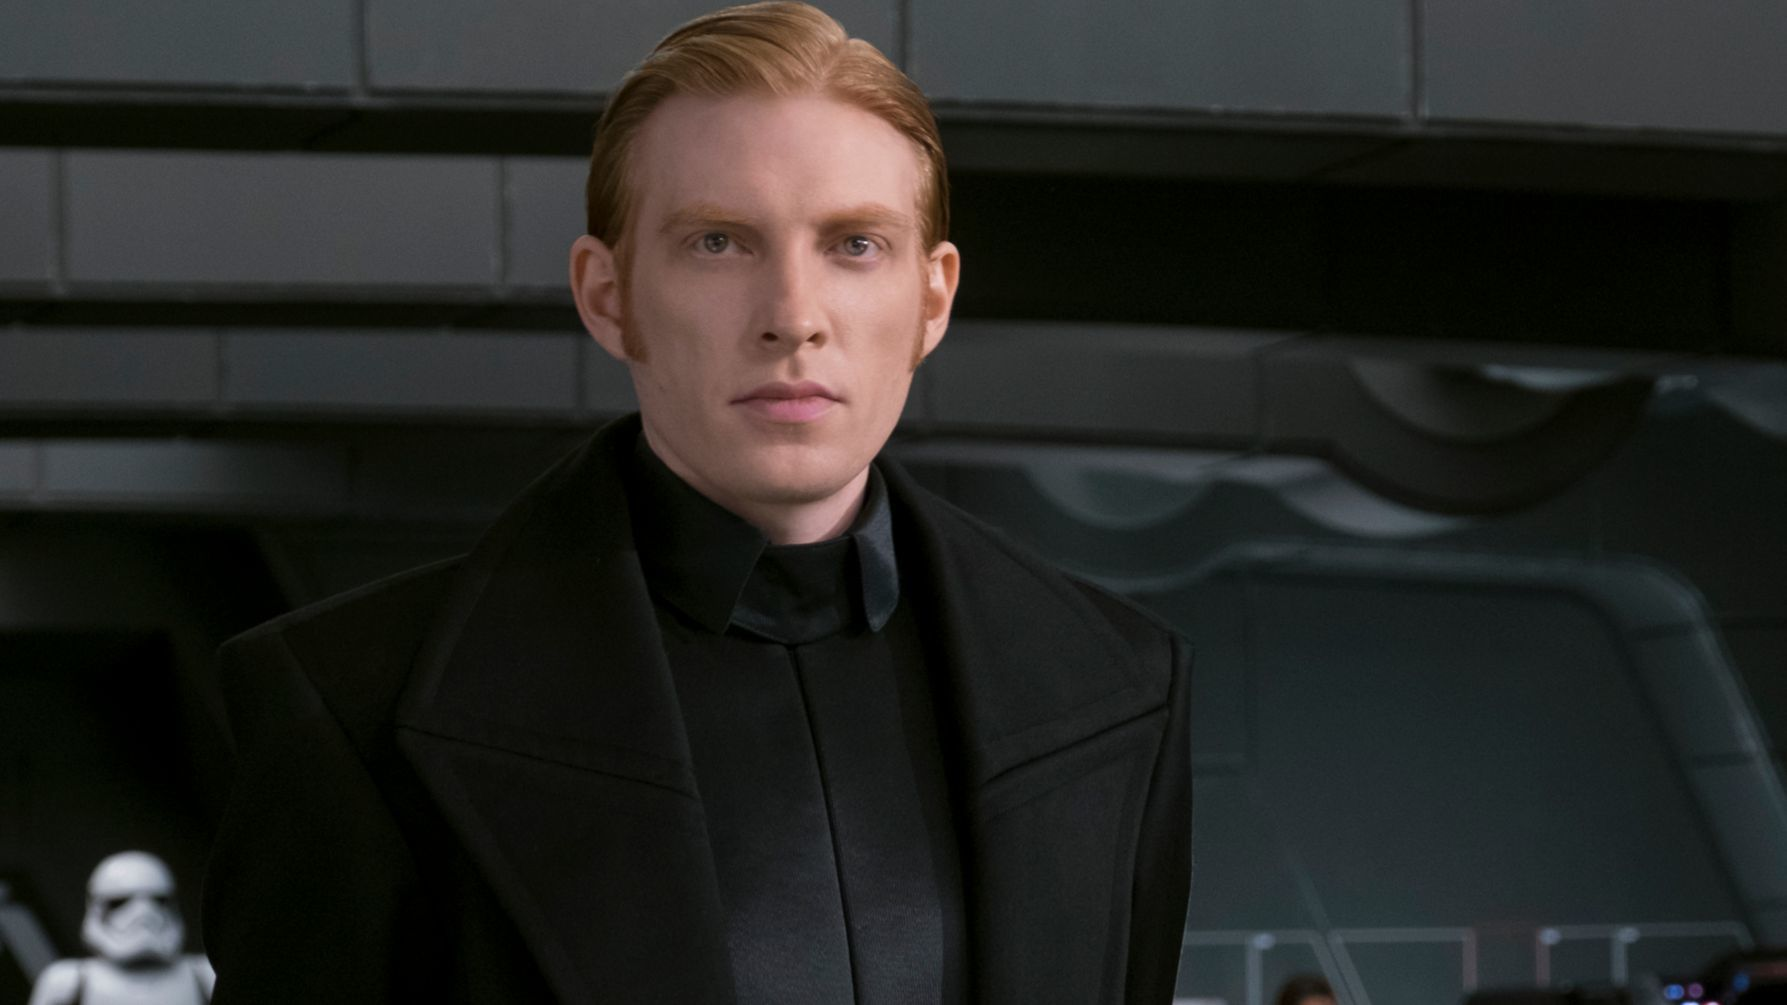 Domhnall Gleeson | 'Star Wars: The Last Jedi'